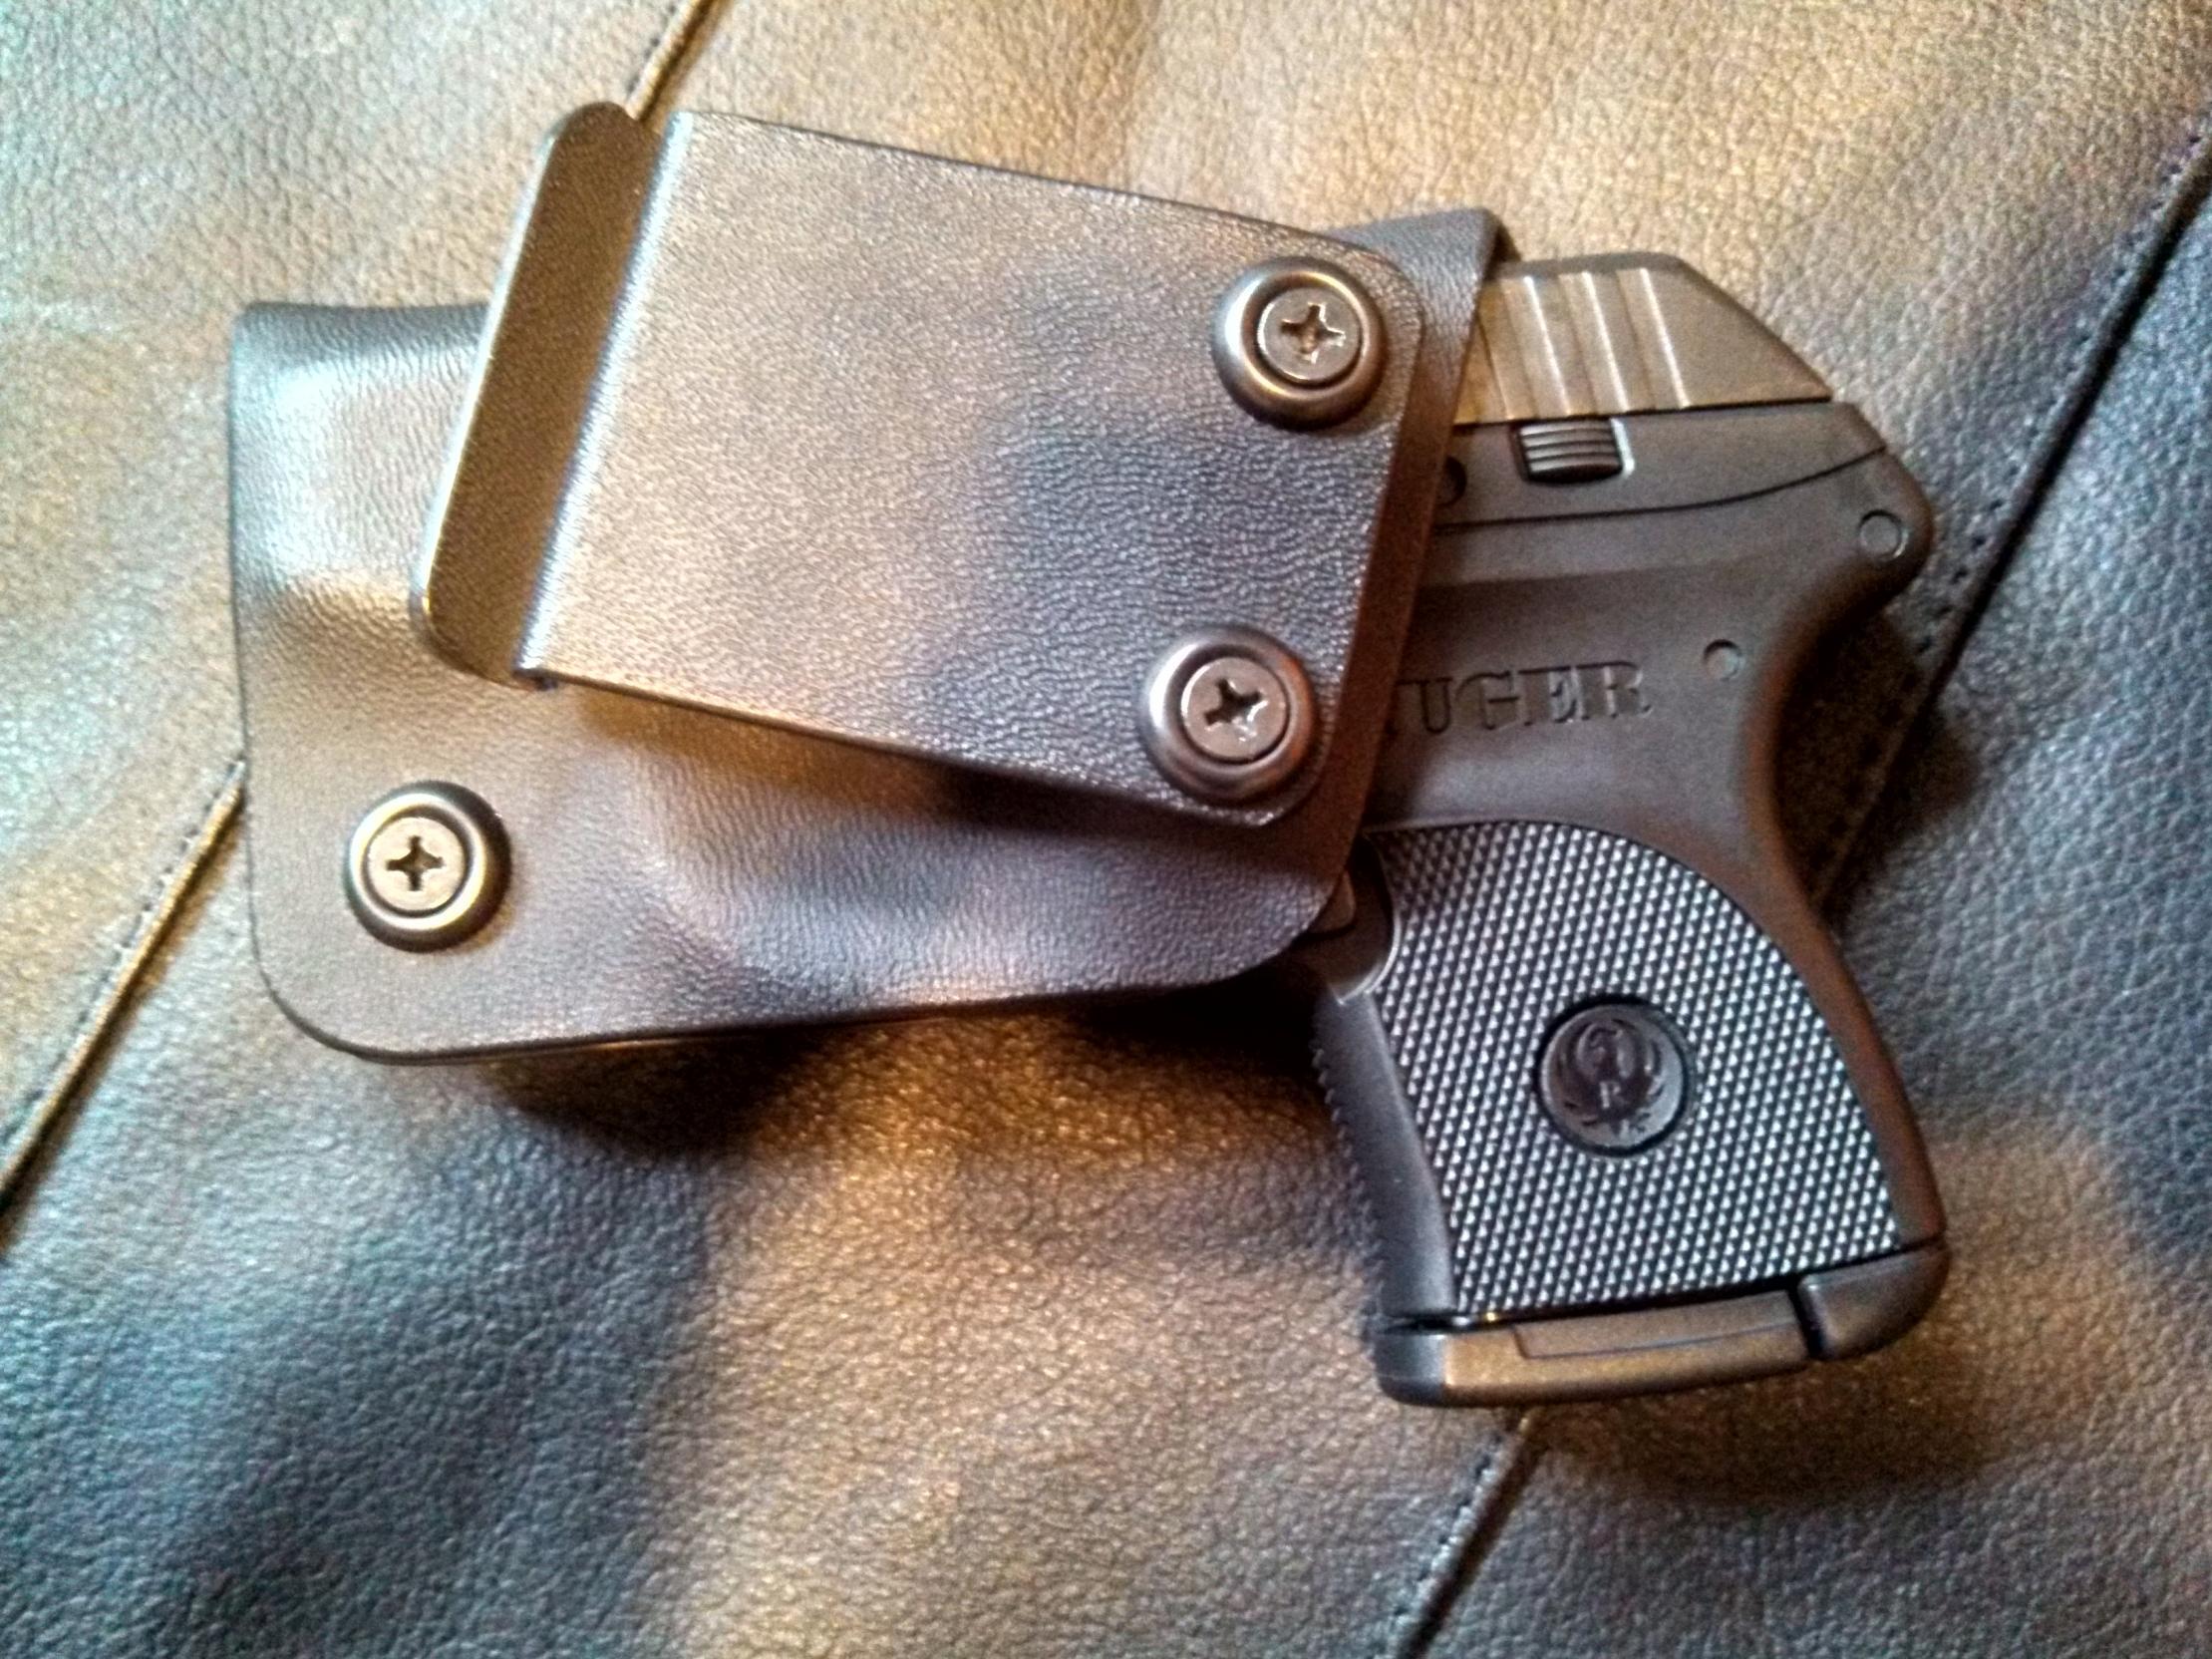 New Gun-img_20130702_174640_319.jpg